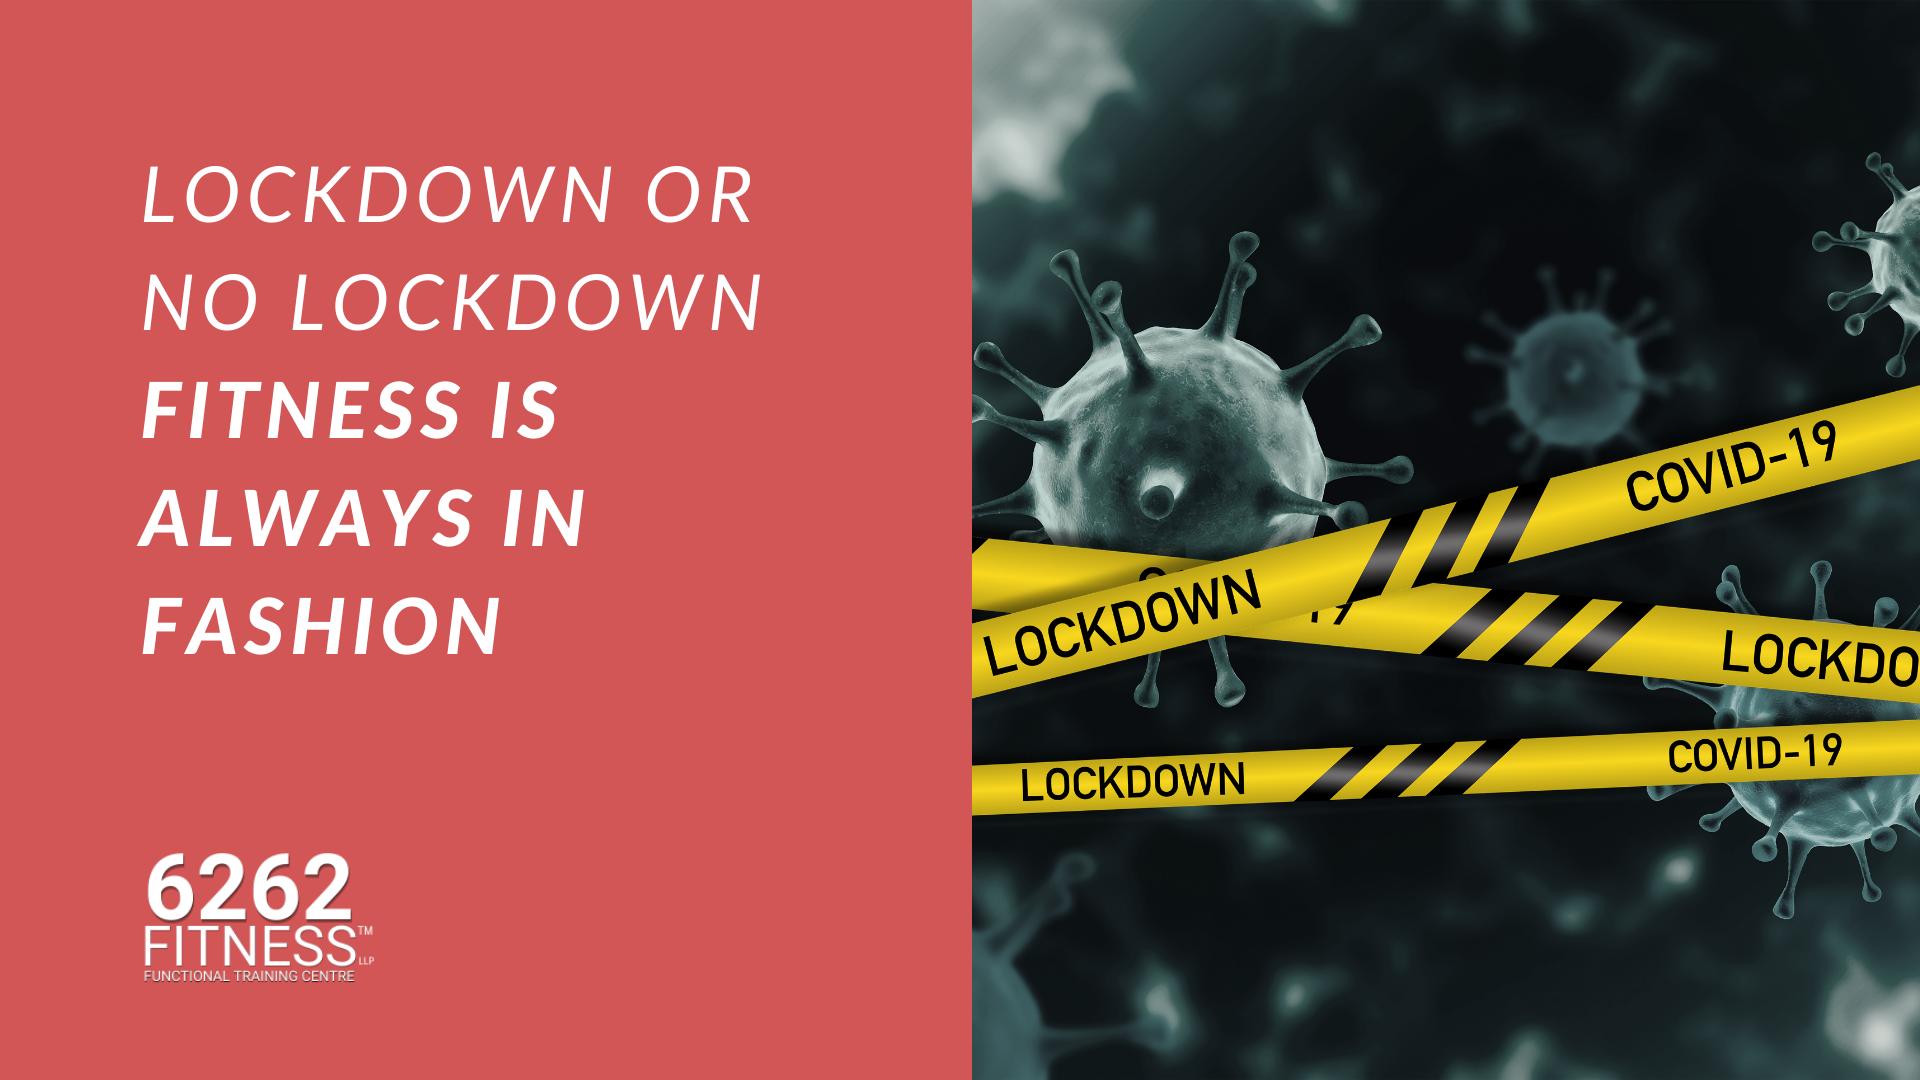 Lockdown or No Lockdown Fitness is always in Fashion